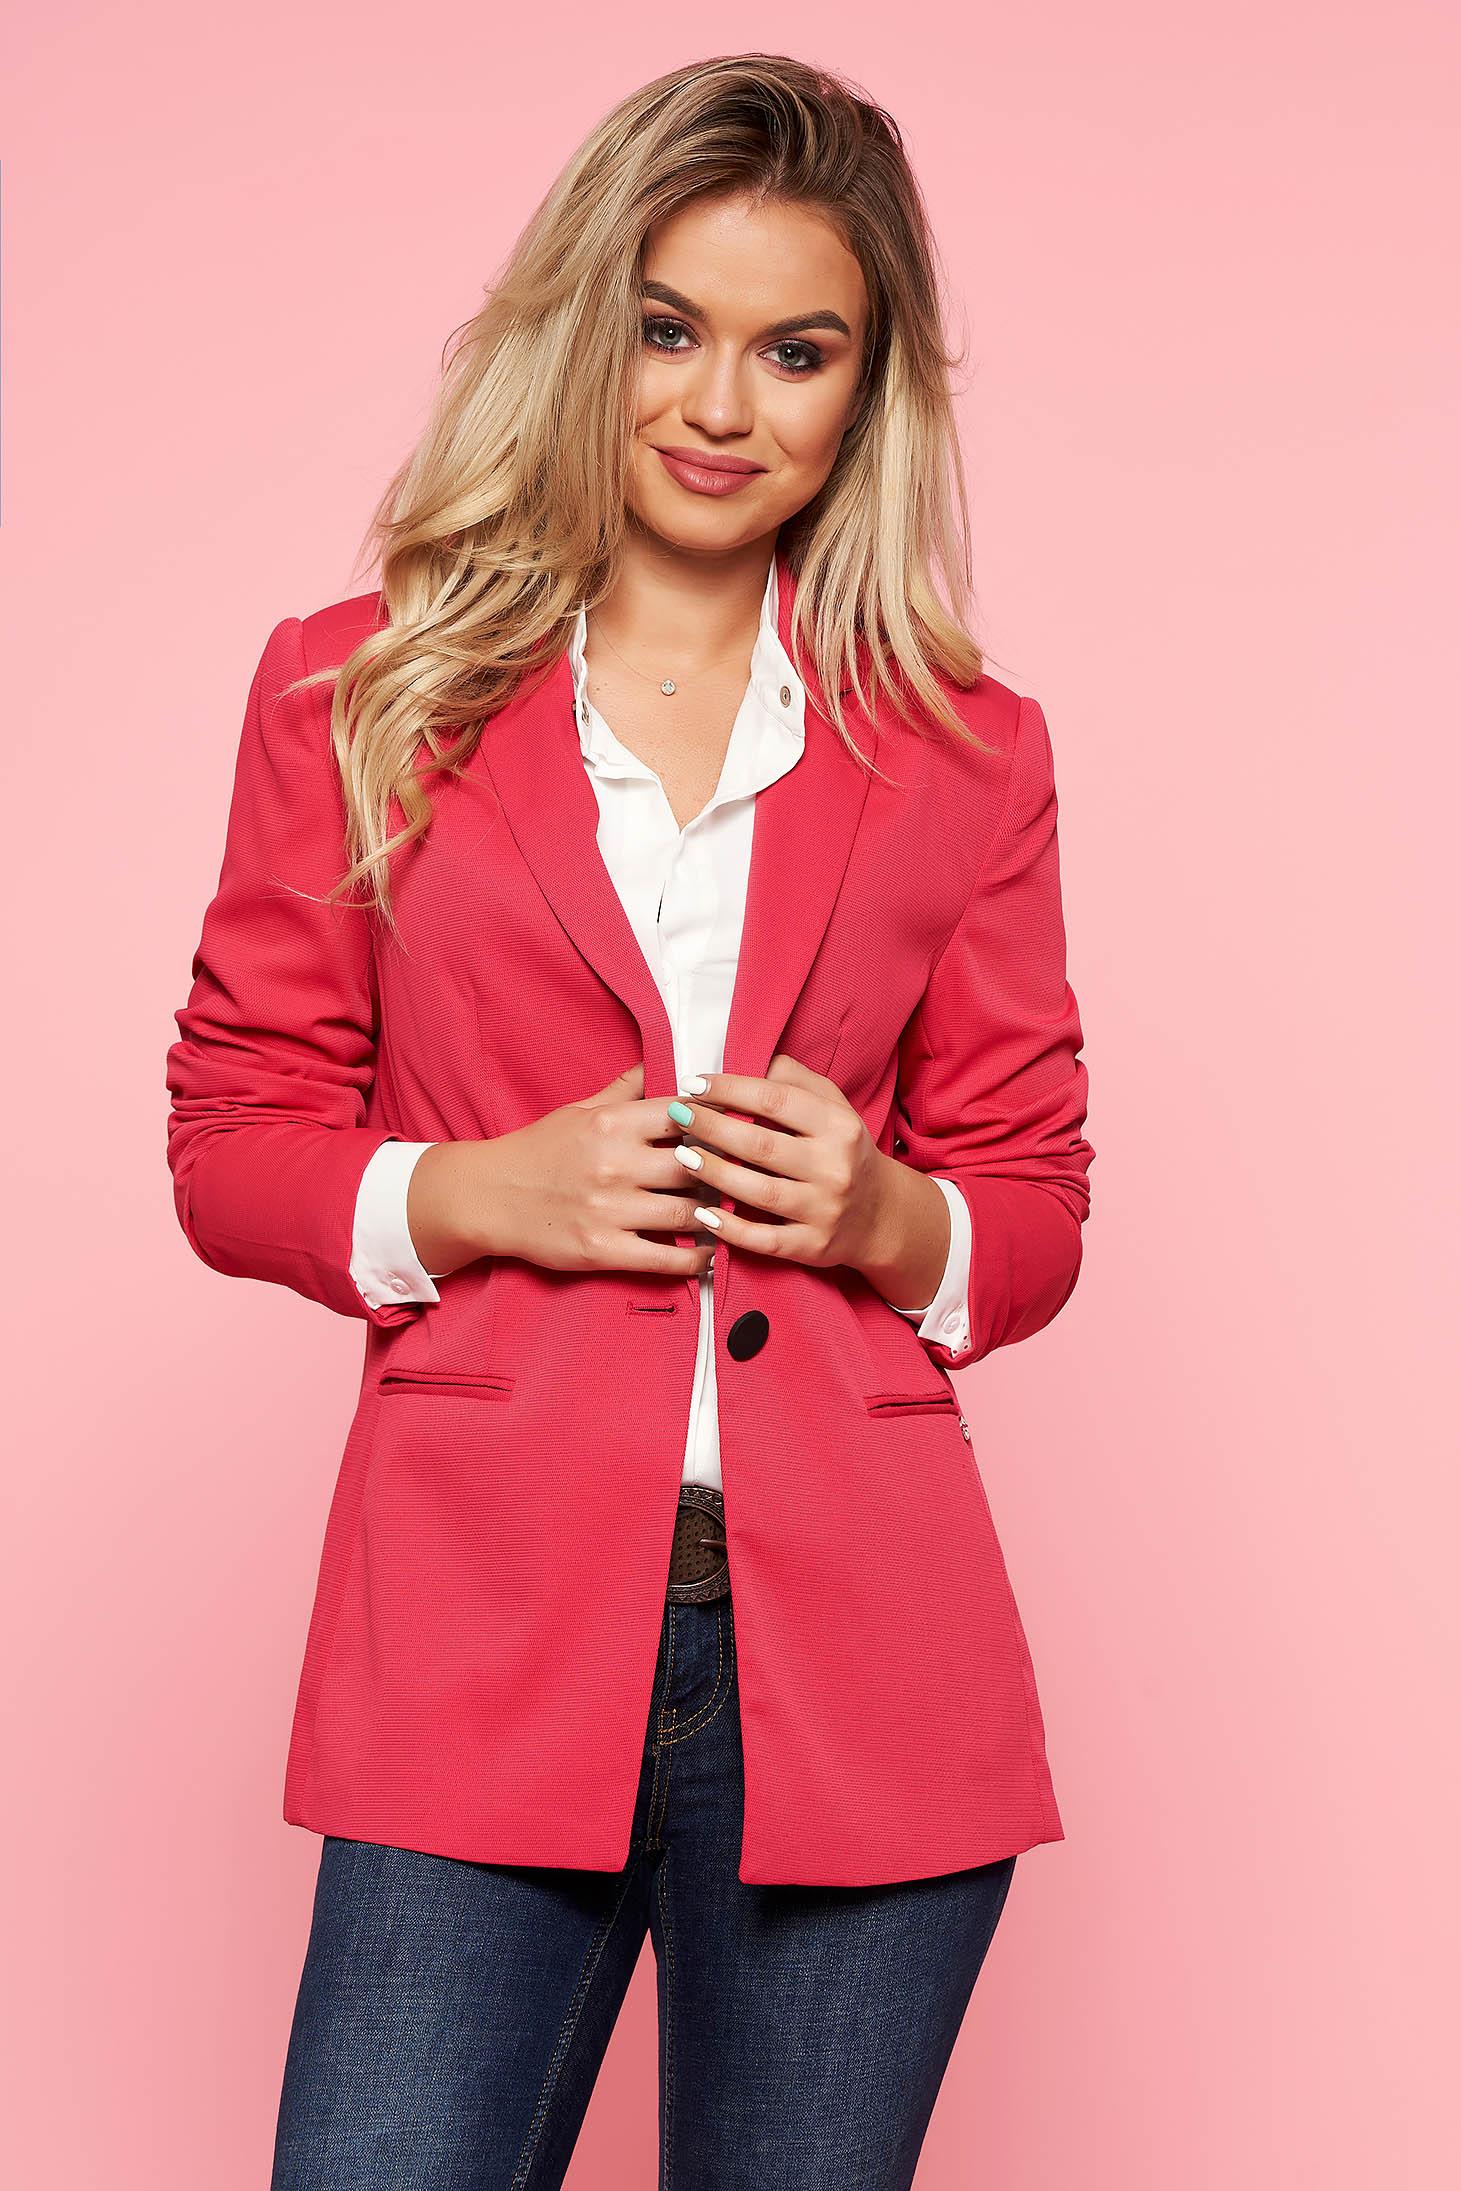 Sacou Top Secret roz-inchis office cambrat din material fin la atingere captusit pe interior